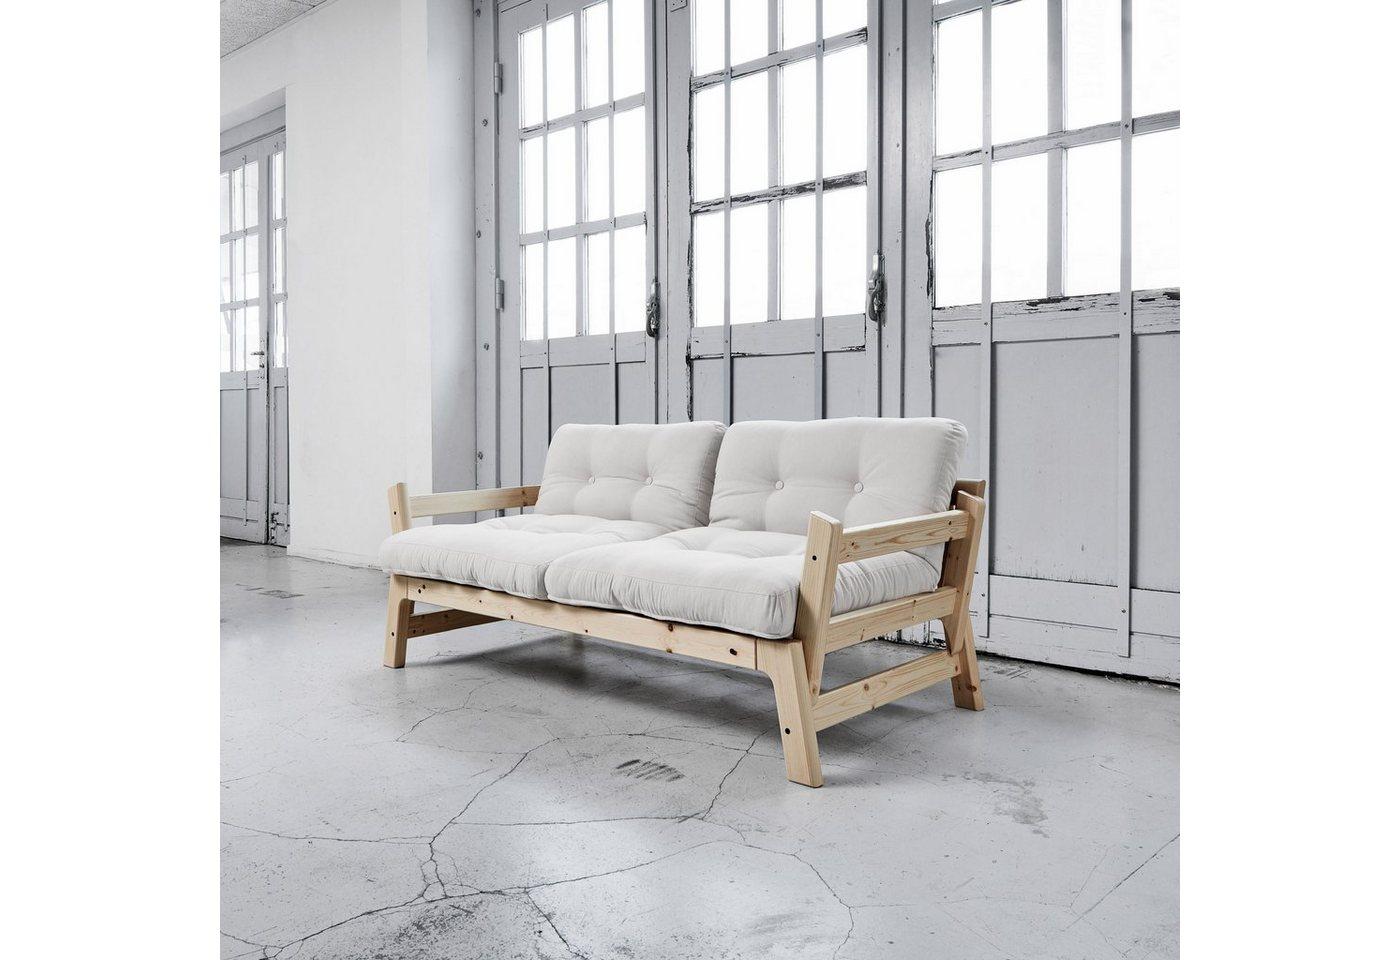 KARUP bedbank incl. futonmatrassen